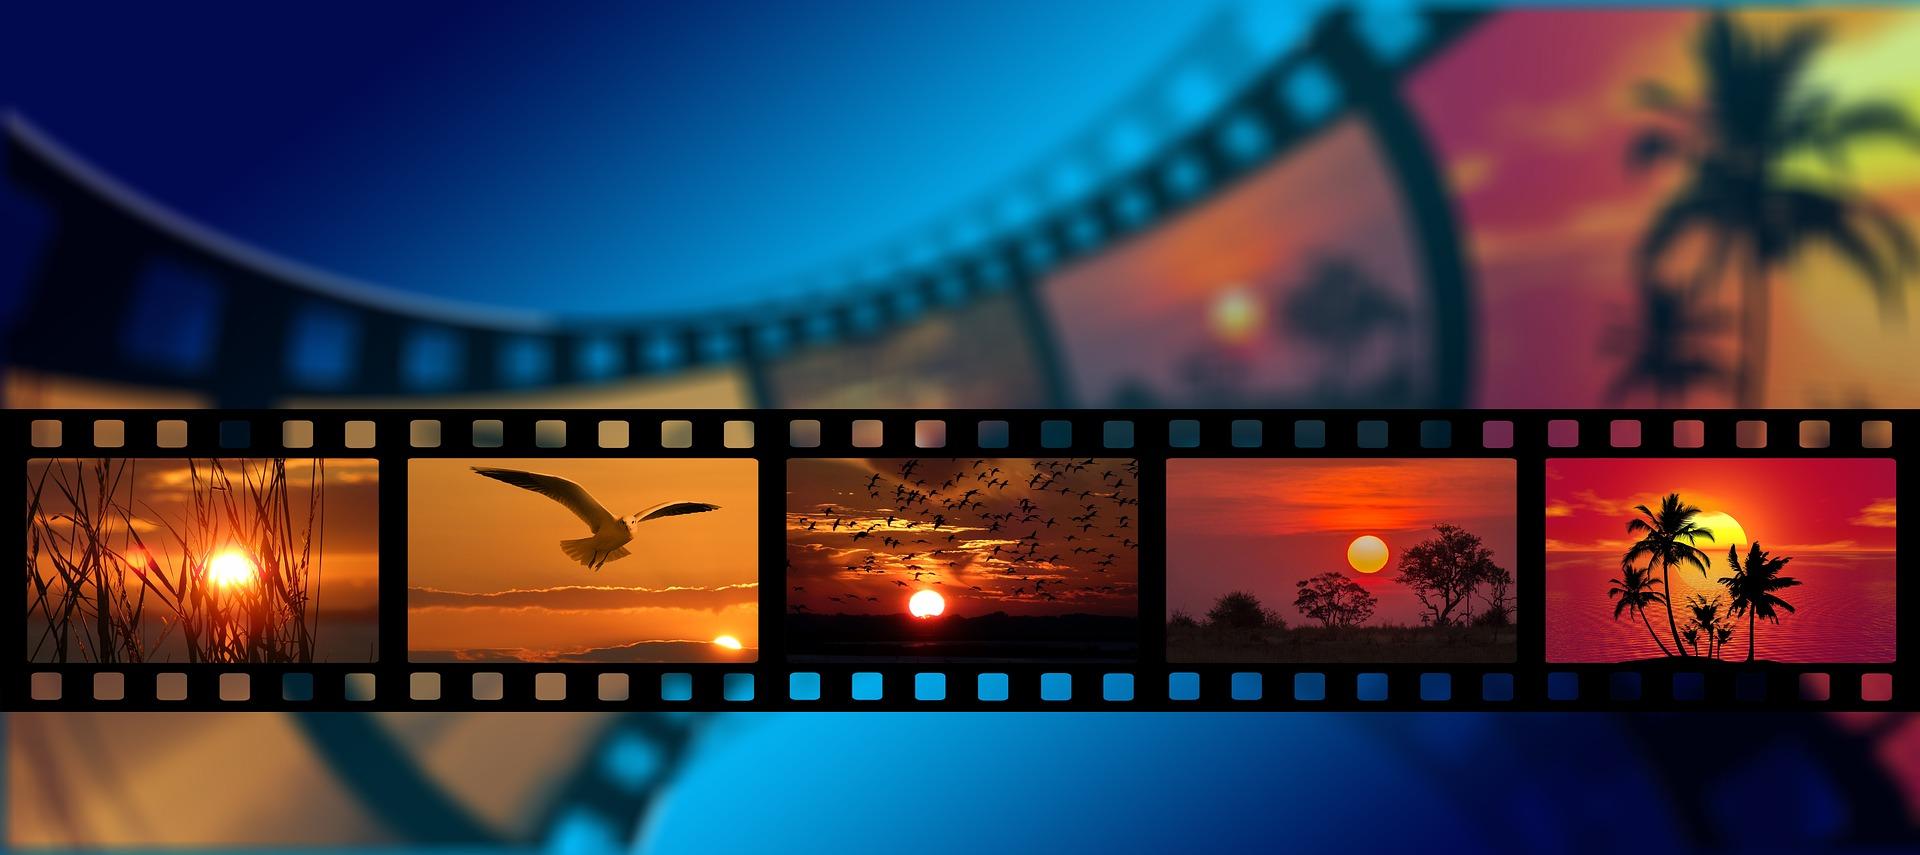 Videos are getting larger Digital Assets a DAM Platform can help